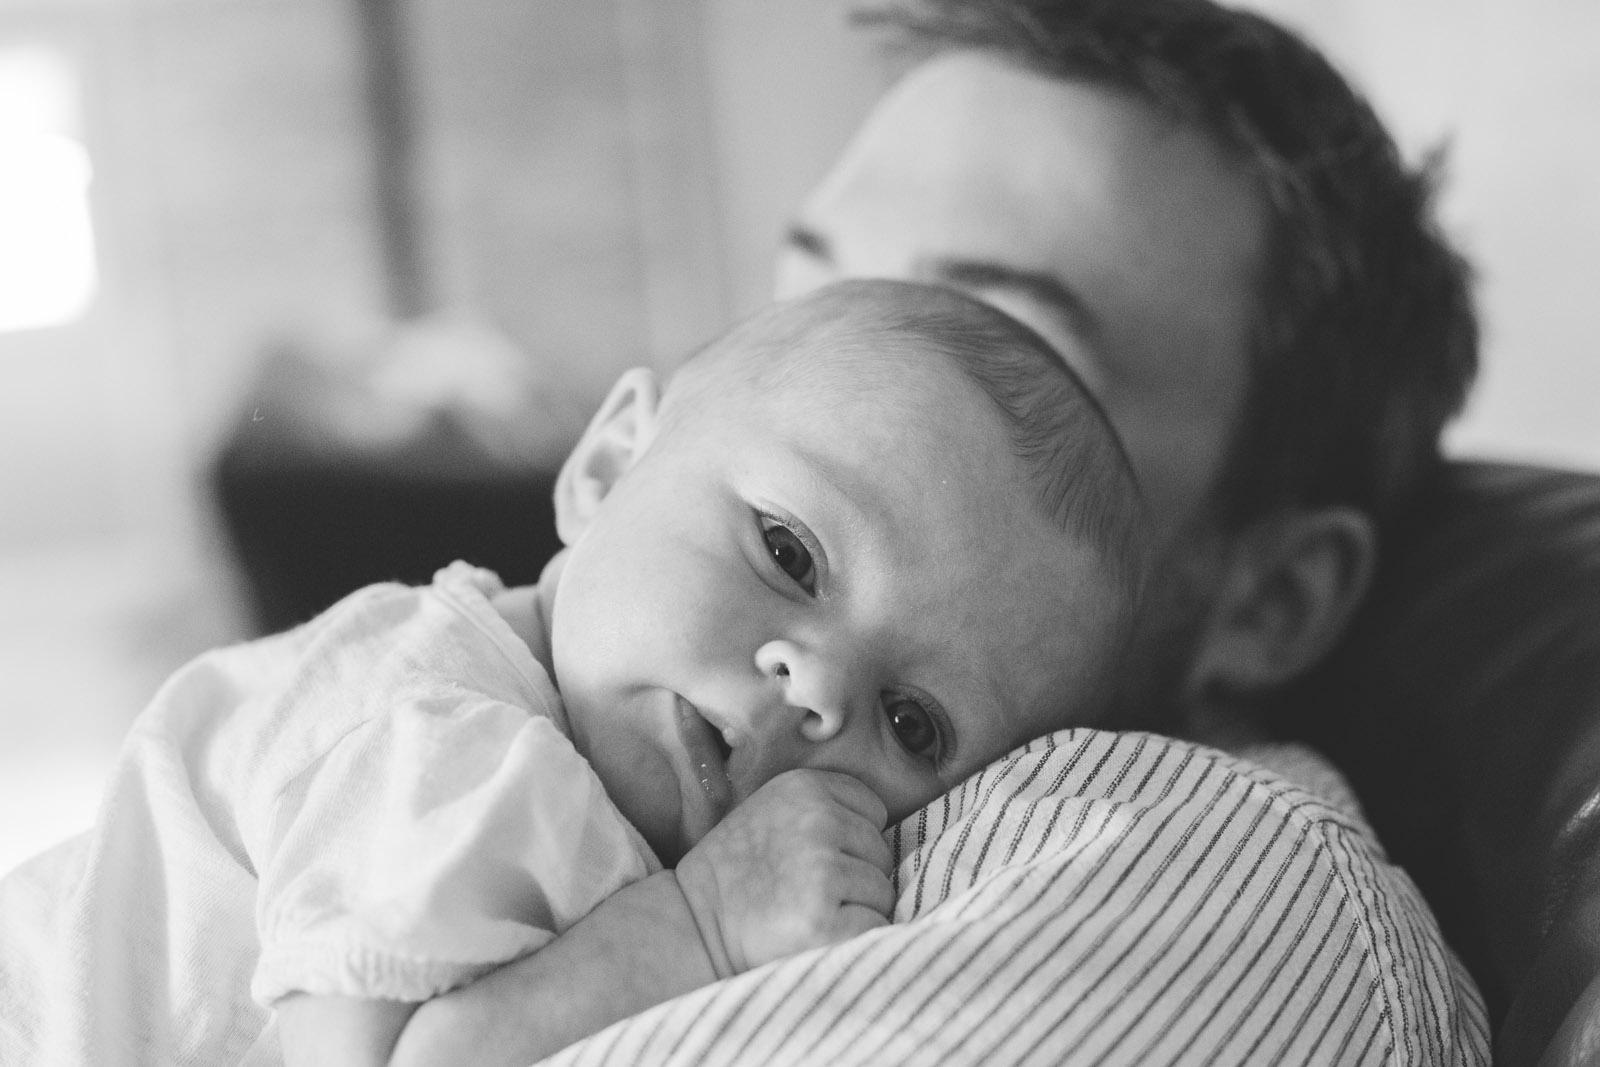 054-newborn-baby-fatherhood-birds-bed-cuddling-new-mexico-farmington